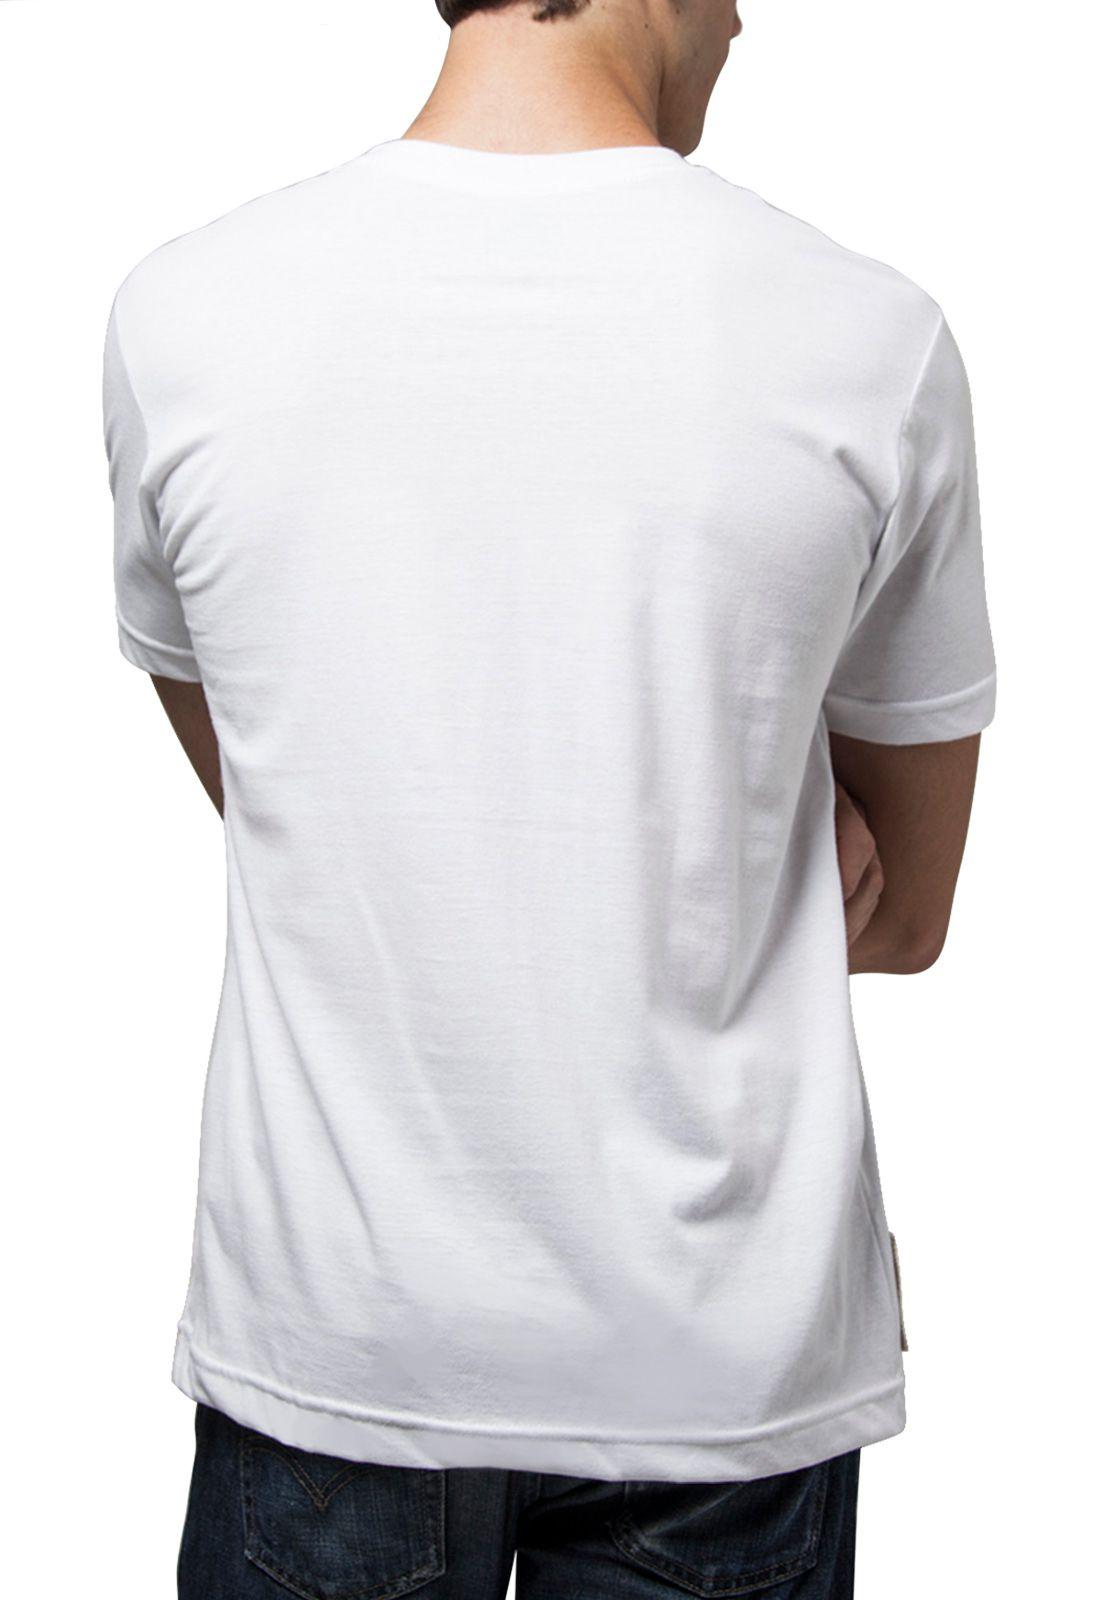 Camiseta Amazônia Tucano Asas Abertas - Branco